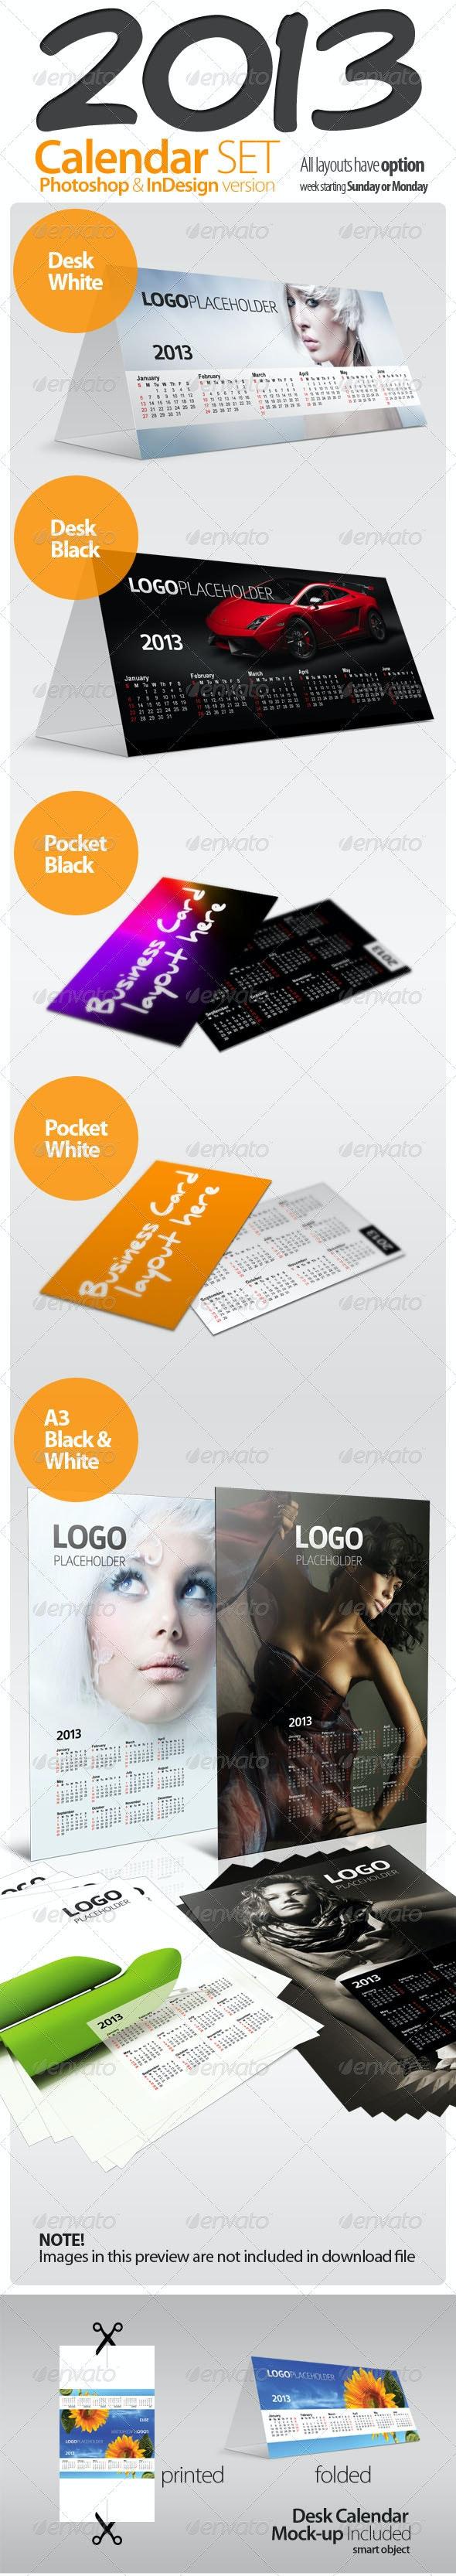 Calendar 2013 Complete Set - Calendars Stationery